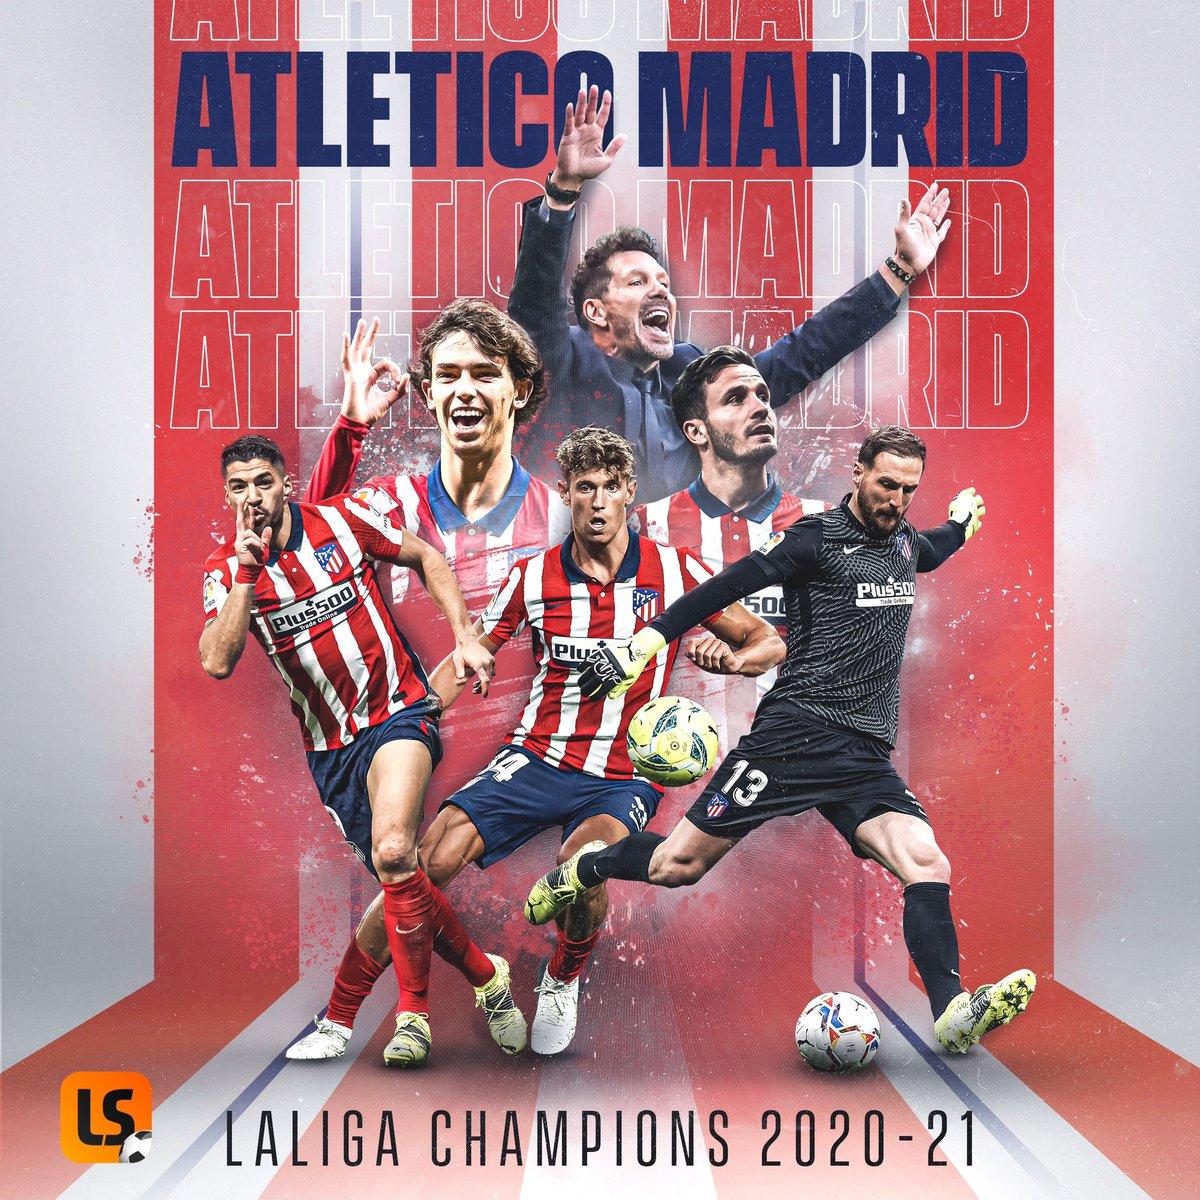 City Radio 88 3 Fm On Twitter Updates Atletico Madrid Is The Champion Of The Year 2020 2021 Season In La Liga Congratulations Atletico Madrid Https T Co Qzcs4suqx3